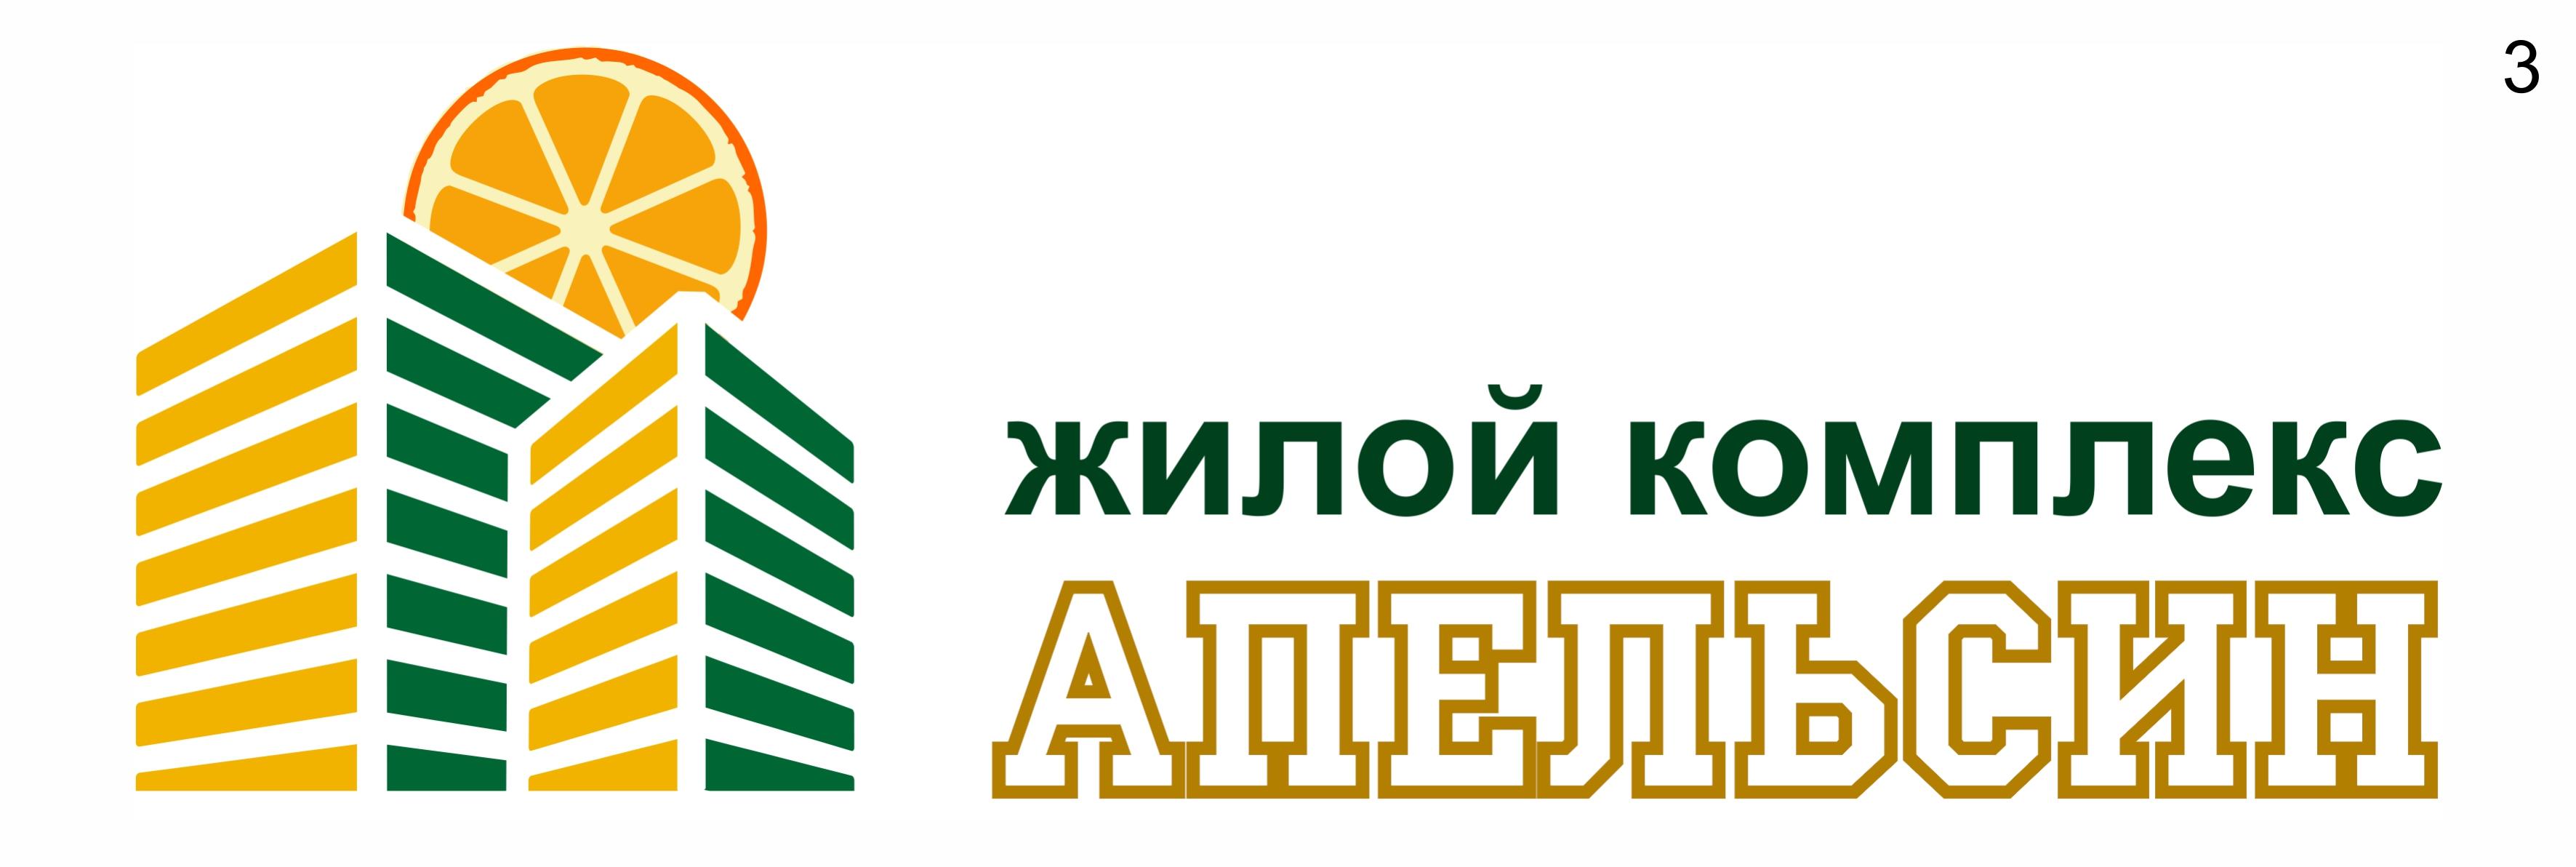 Логотип и фирменный стиль фото f_5325a6714d8ca7c6.jpg